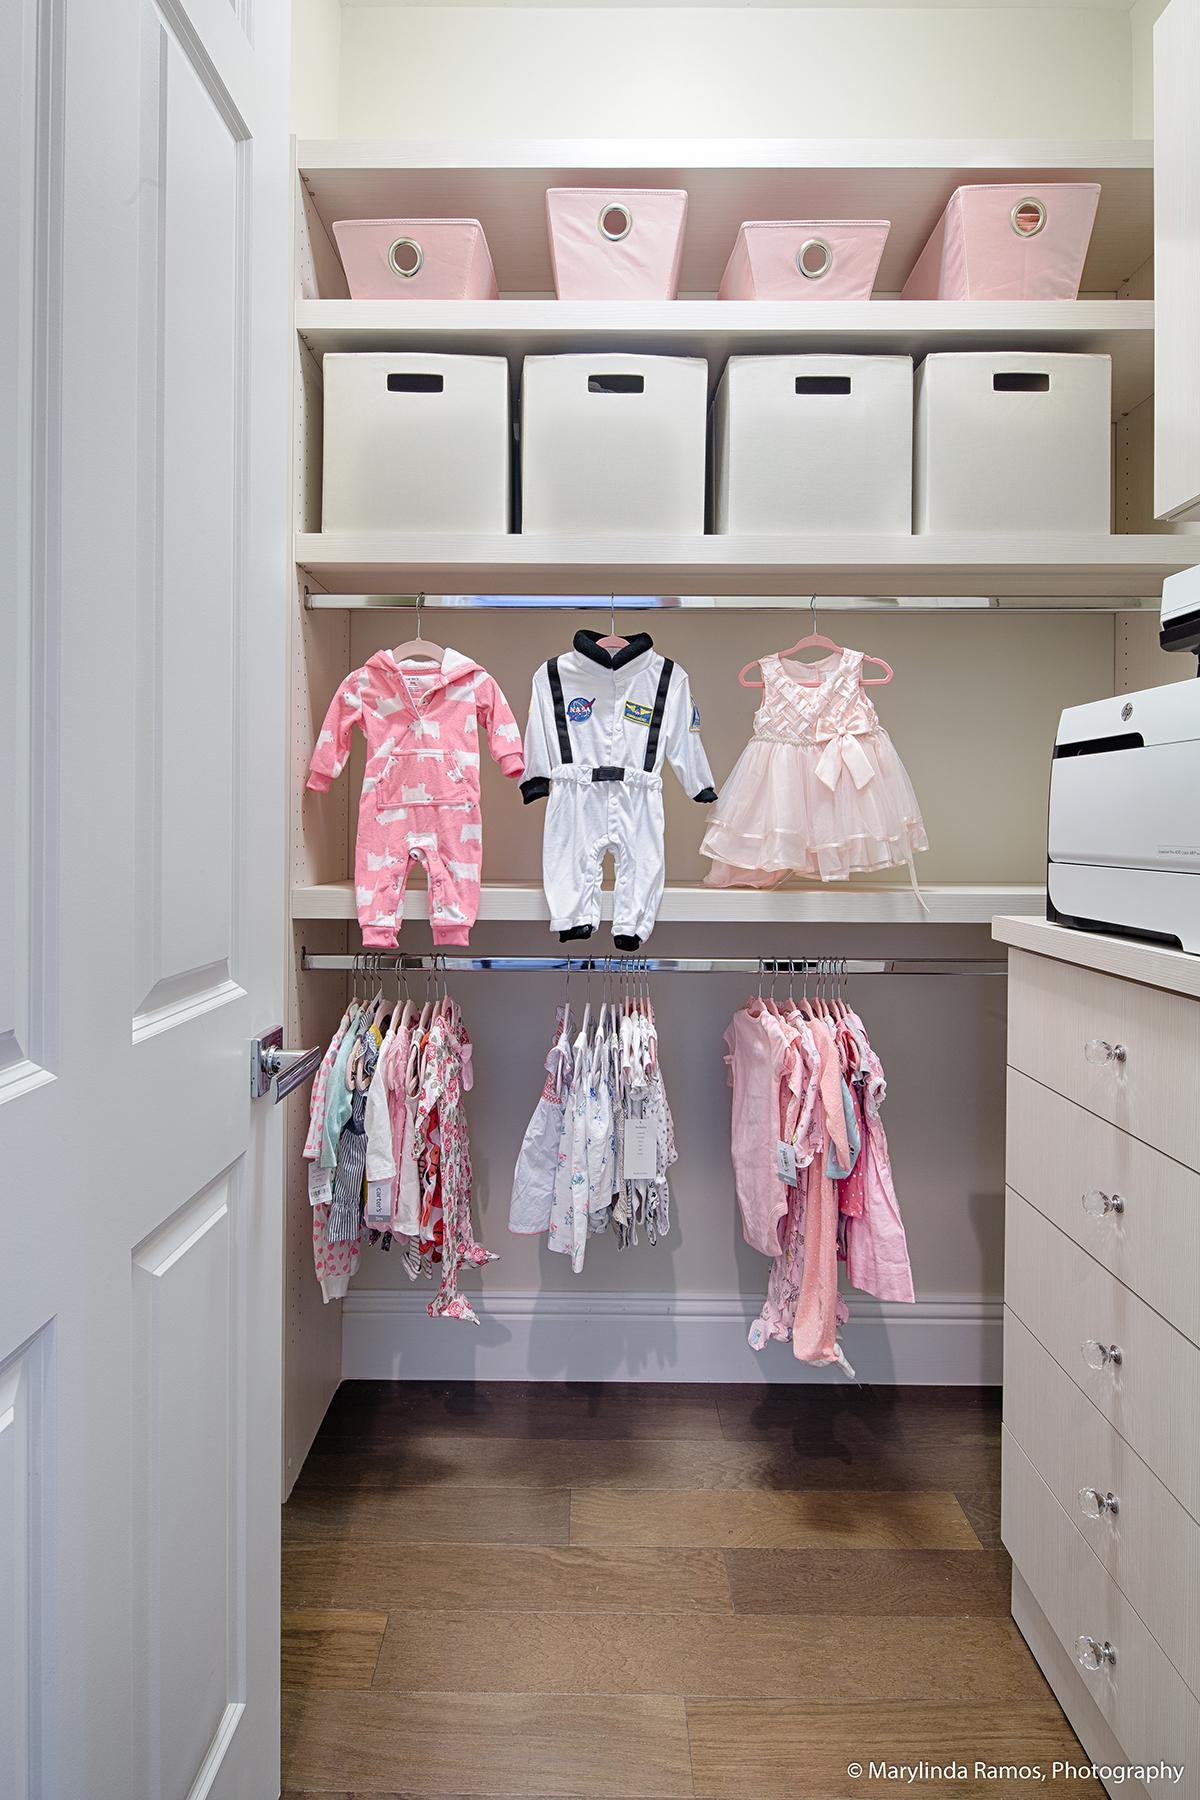 Classic Baby Nursery, Rooms by Eve, Eve Joss, Interior Design in Boca Raton, FL16.jpg